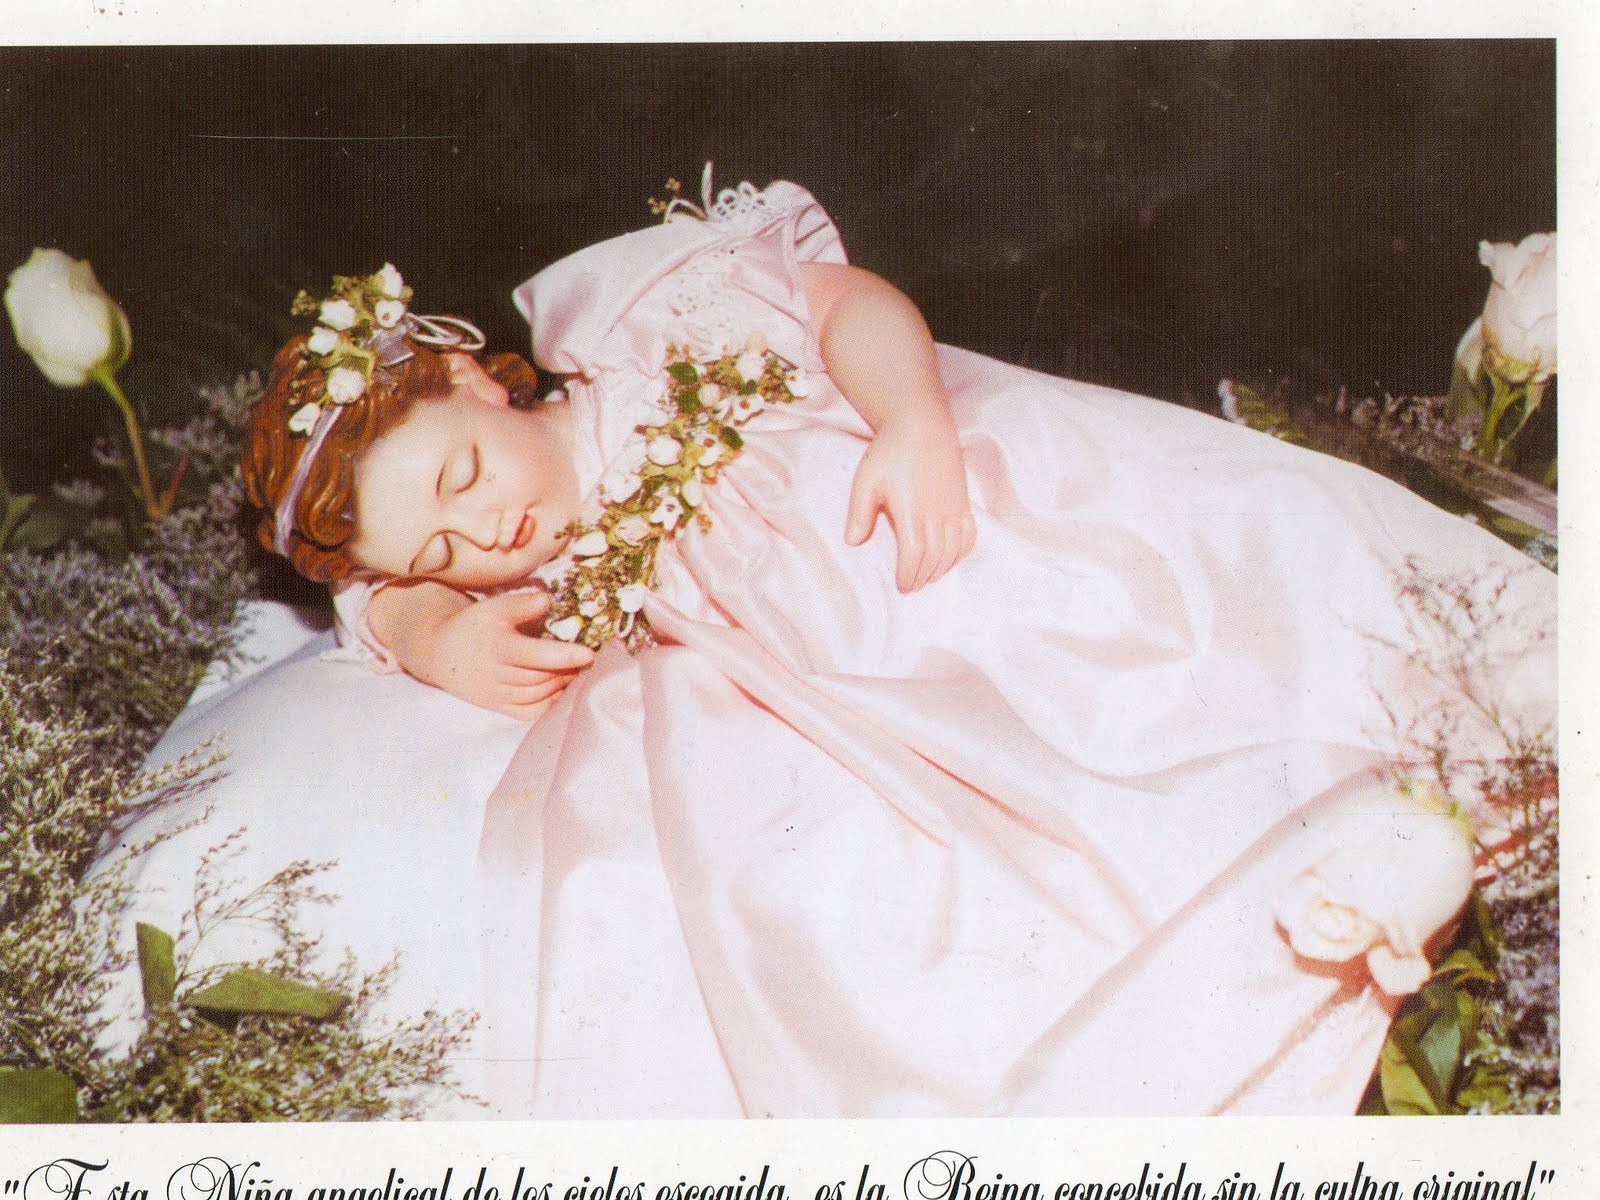 imagenes de la virgen nina: